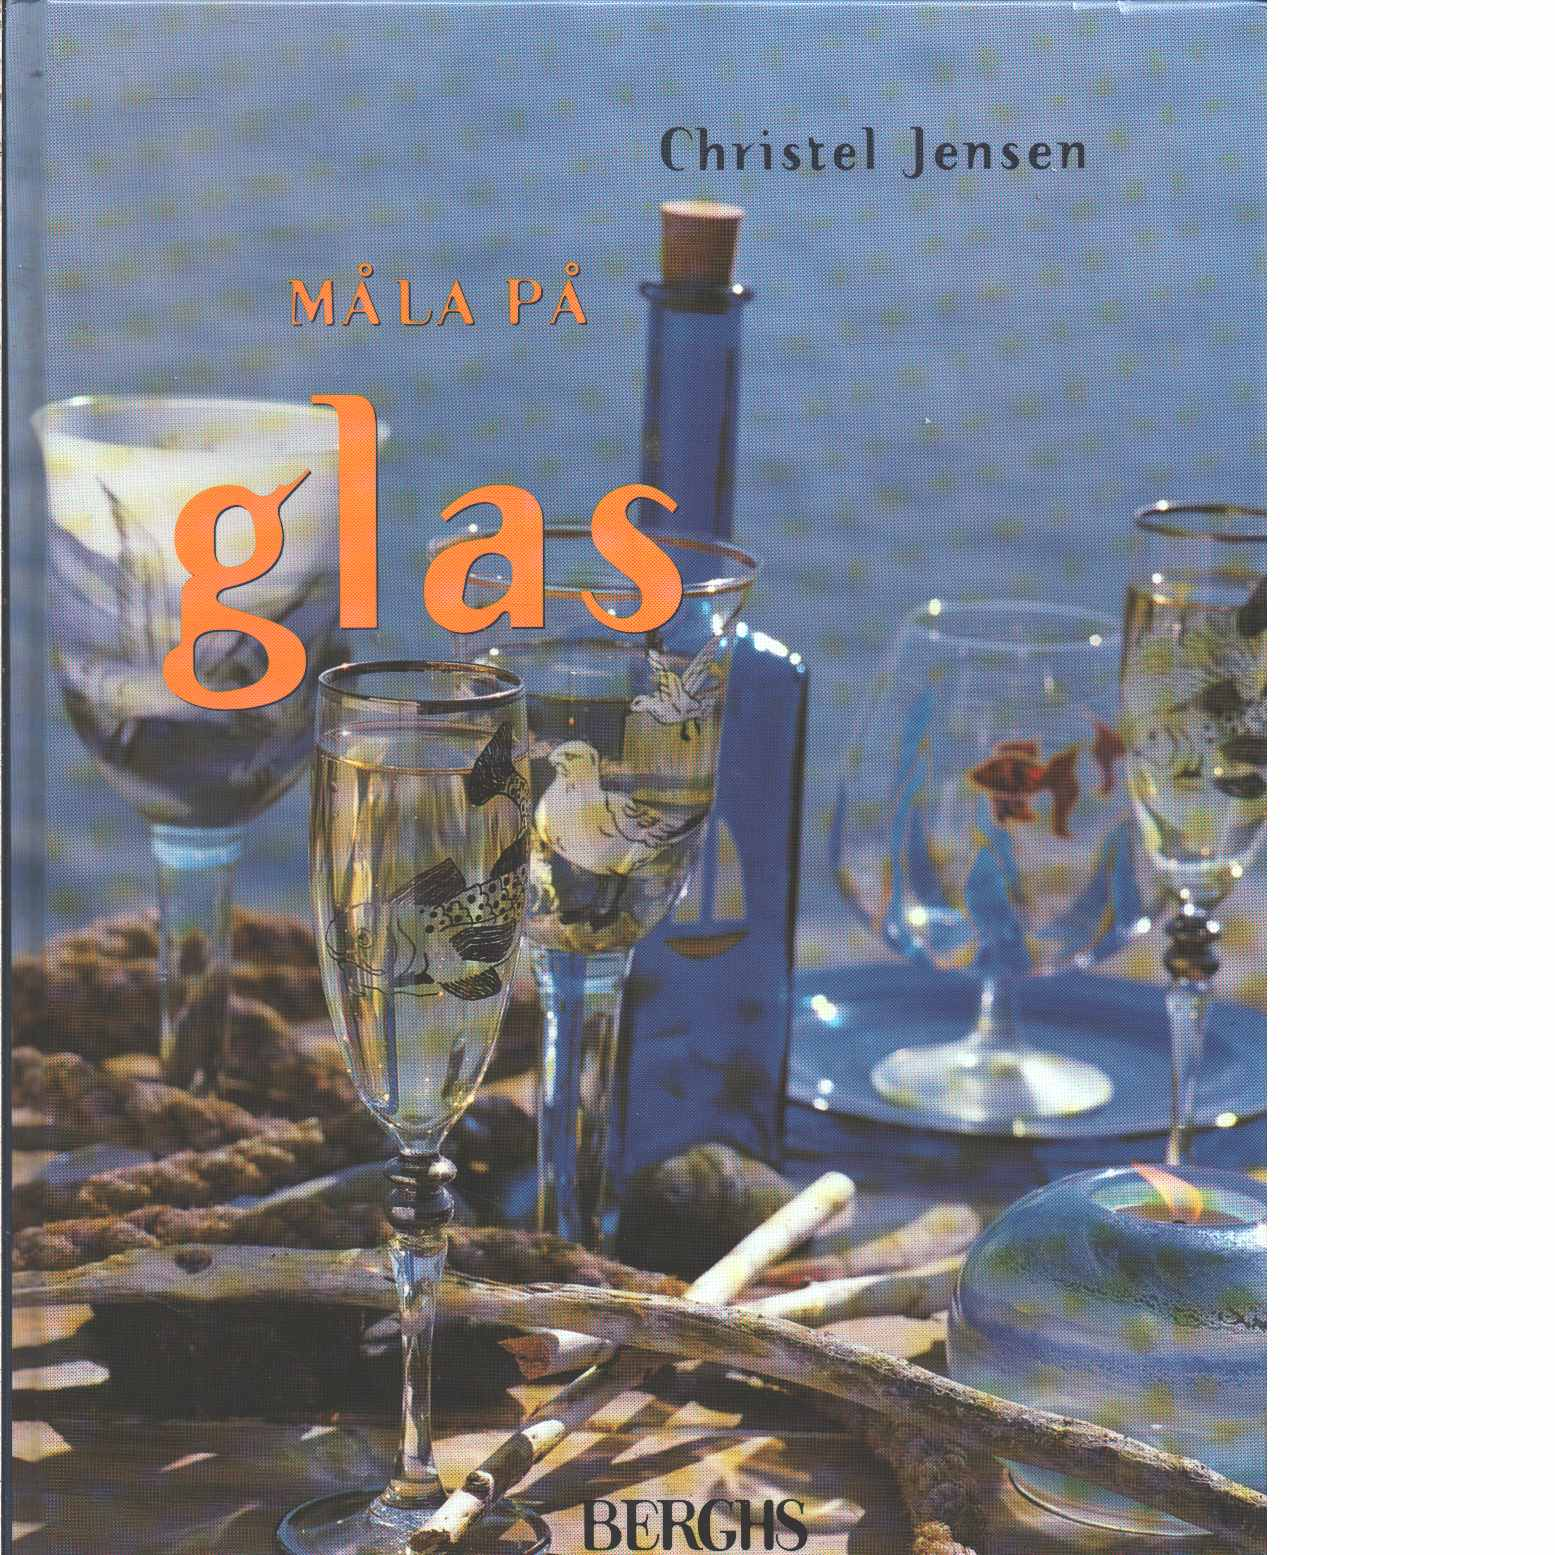 Måla på glas - Jensen, Christel